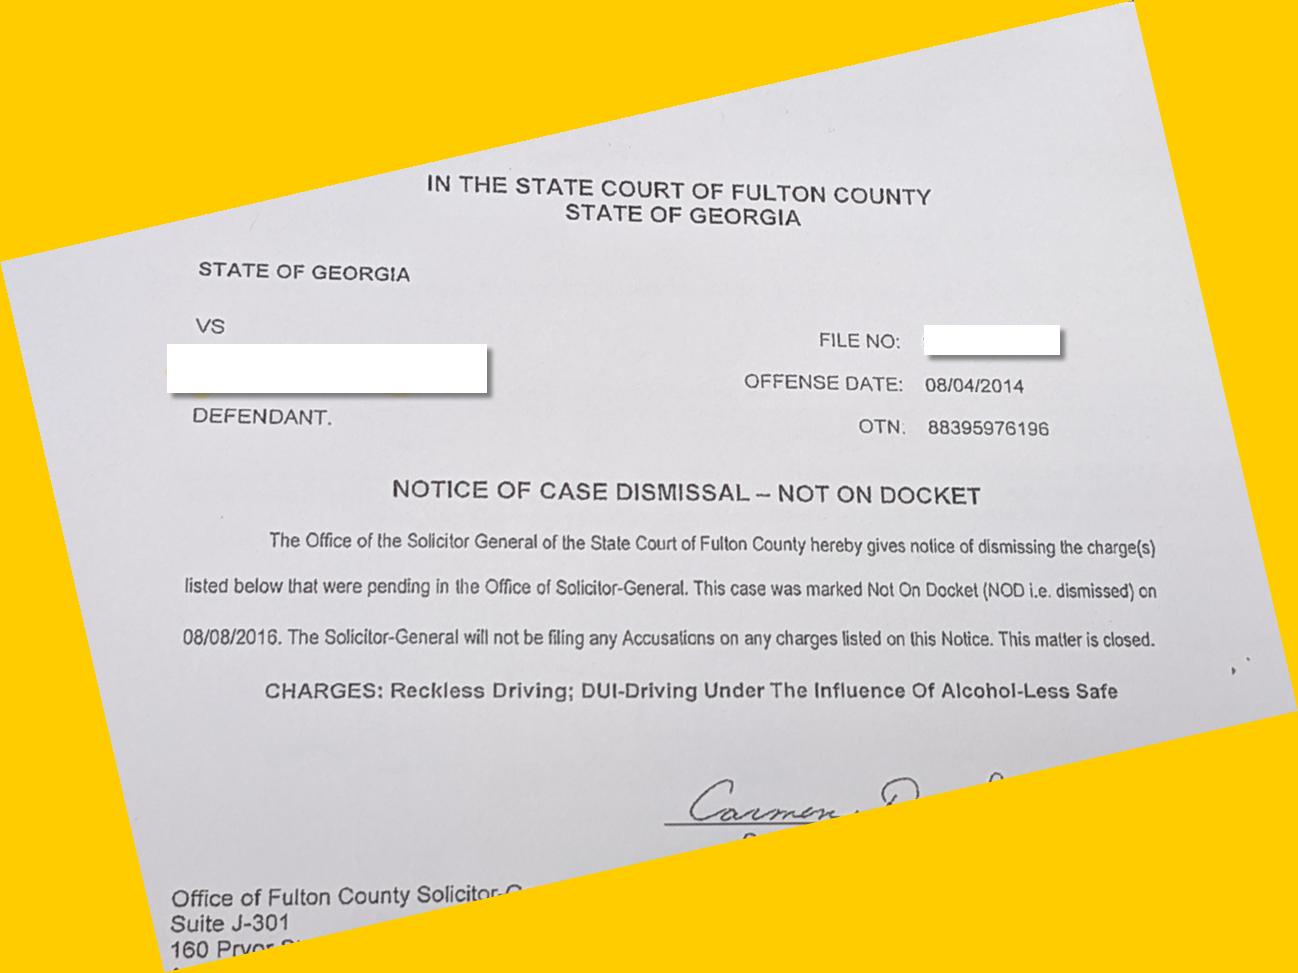 Georgia Notice of Case Dismissal Not on Docket